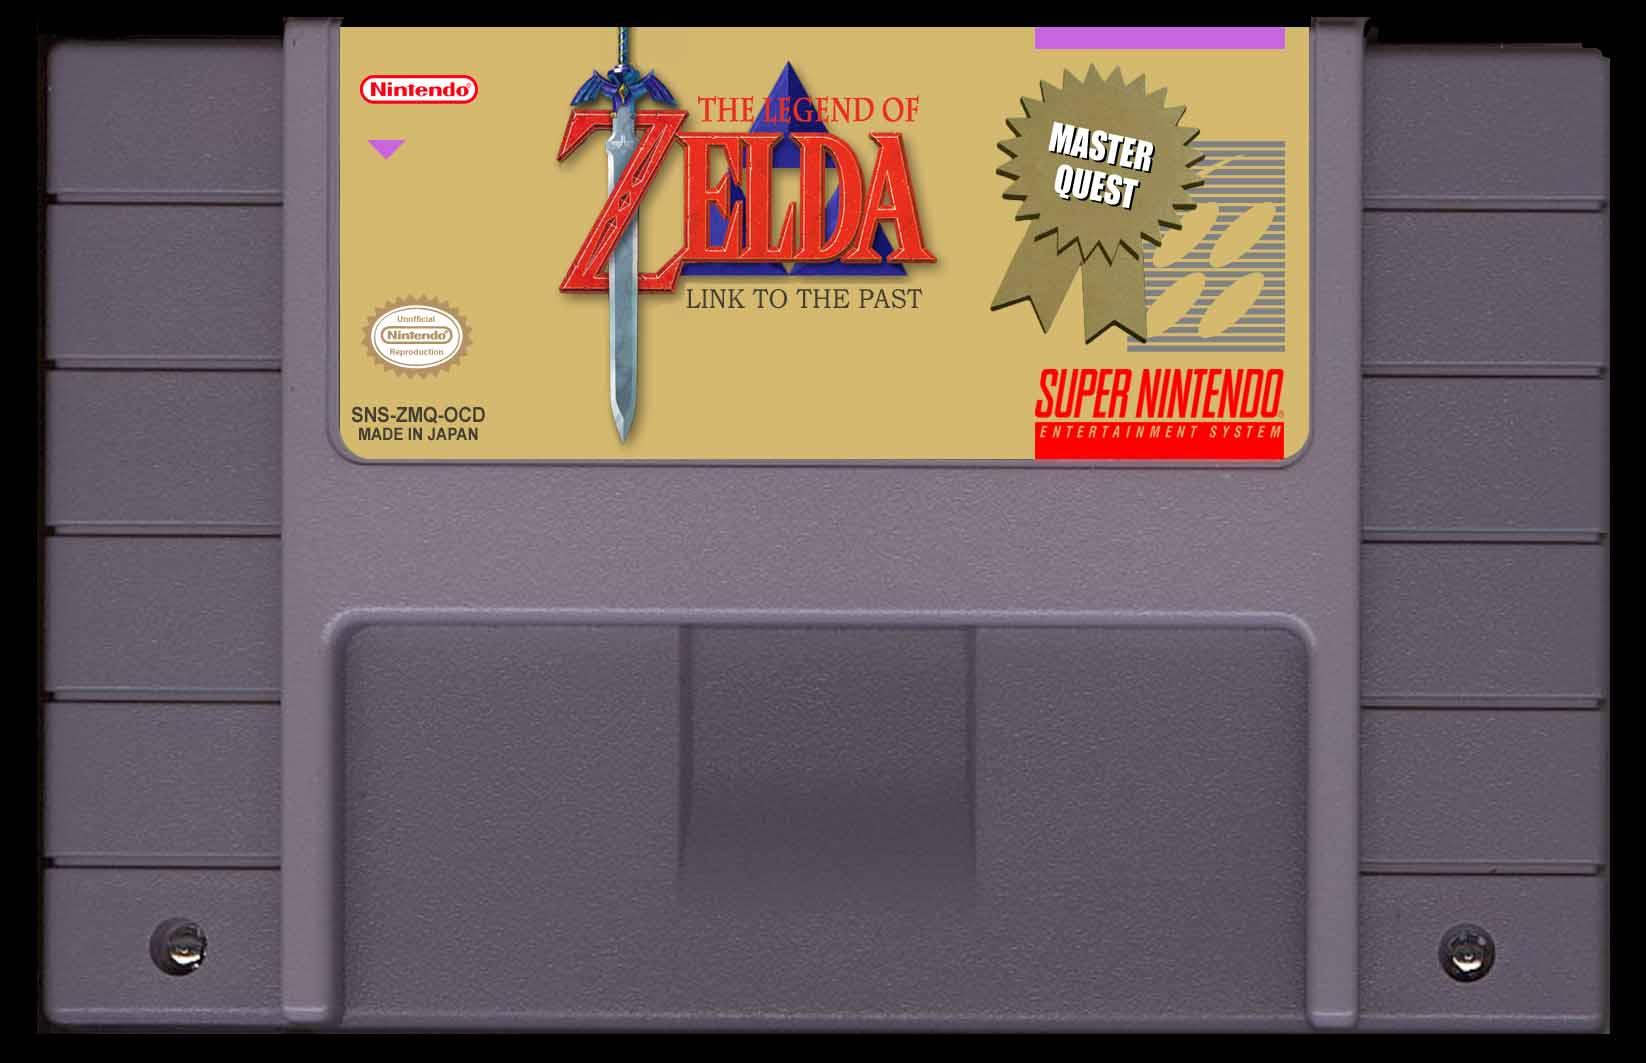 Zelda Link to the Past Master Quest